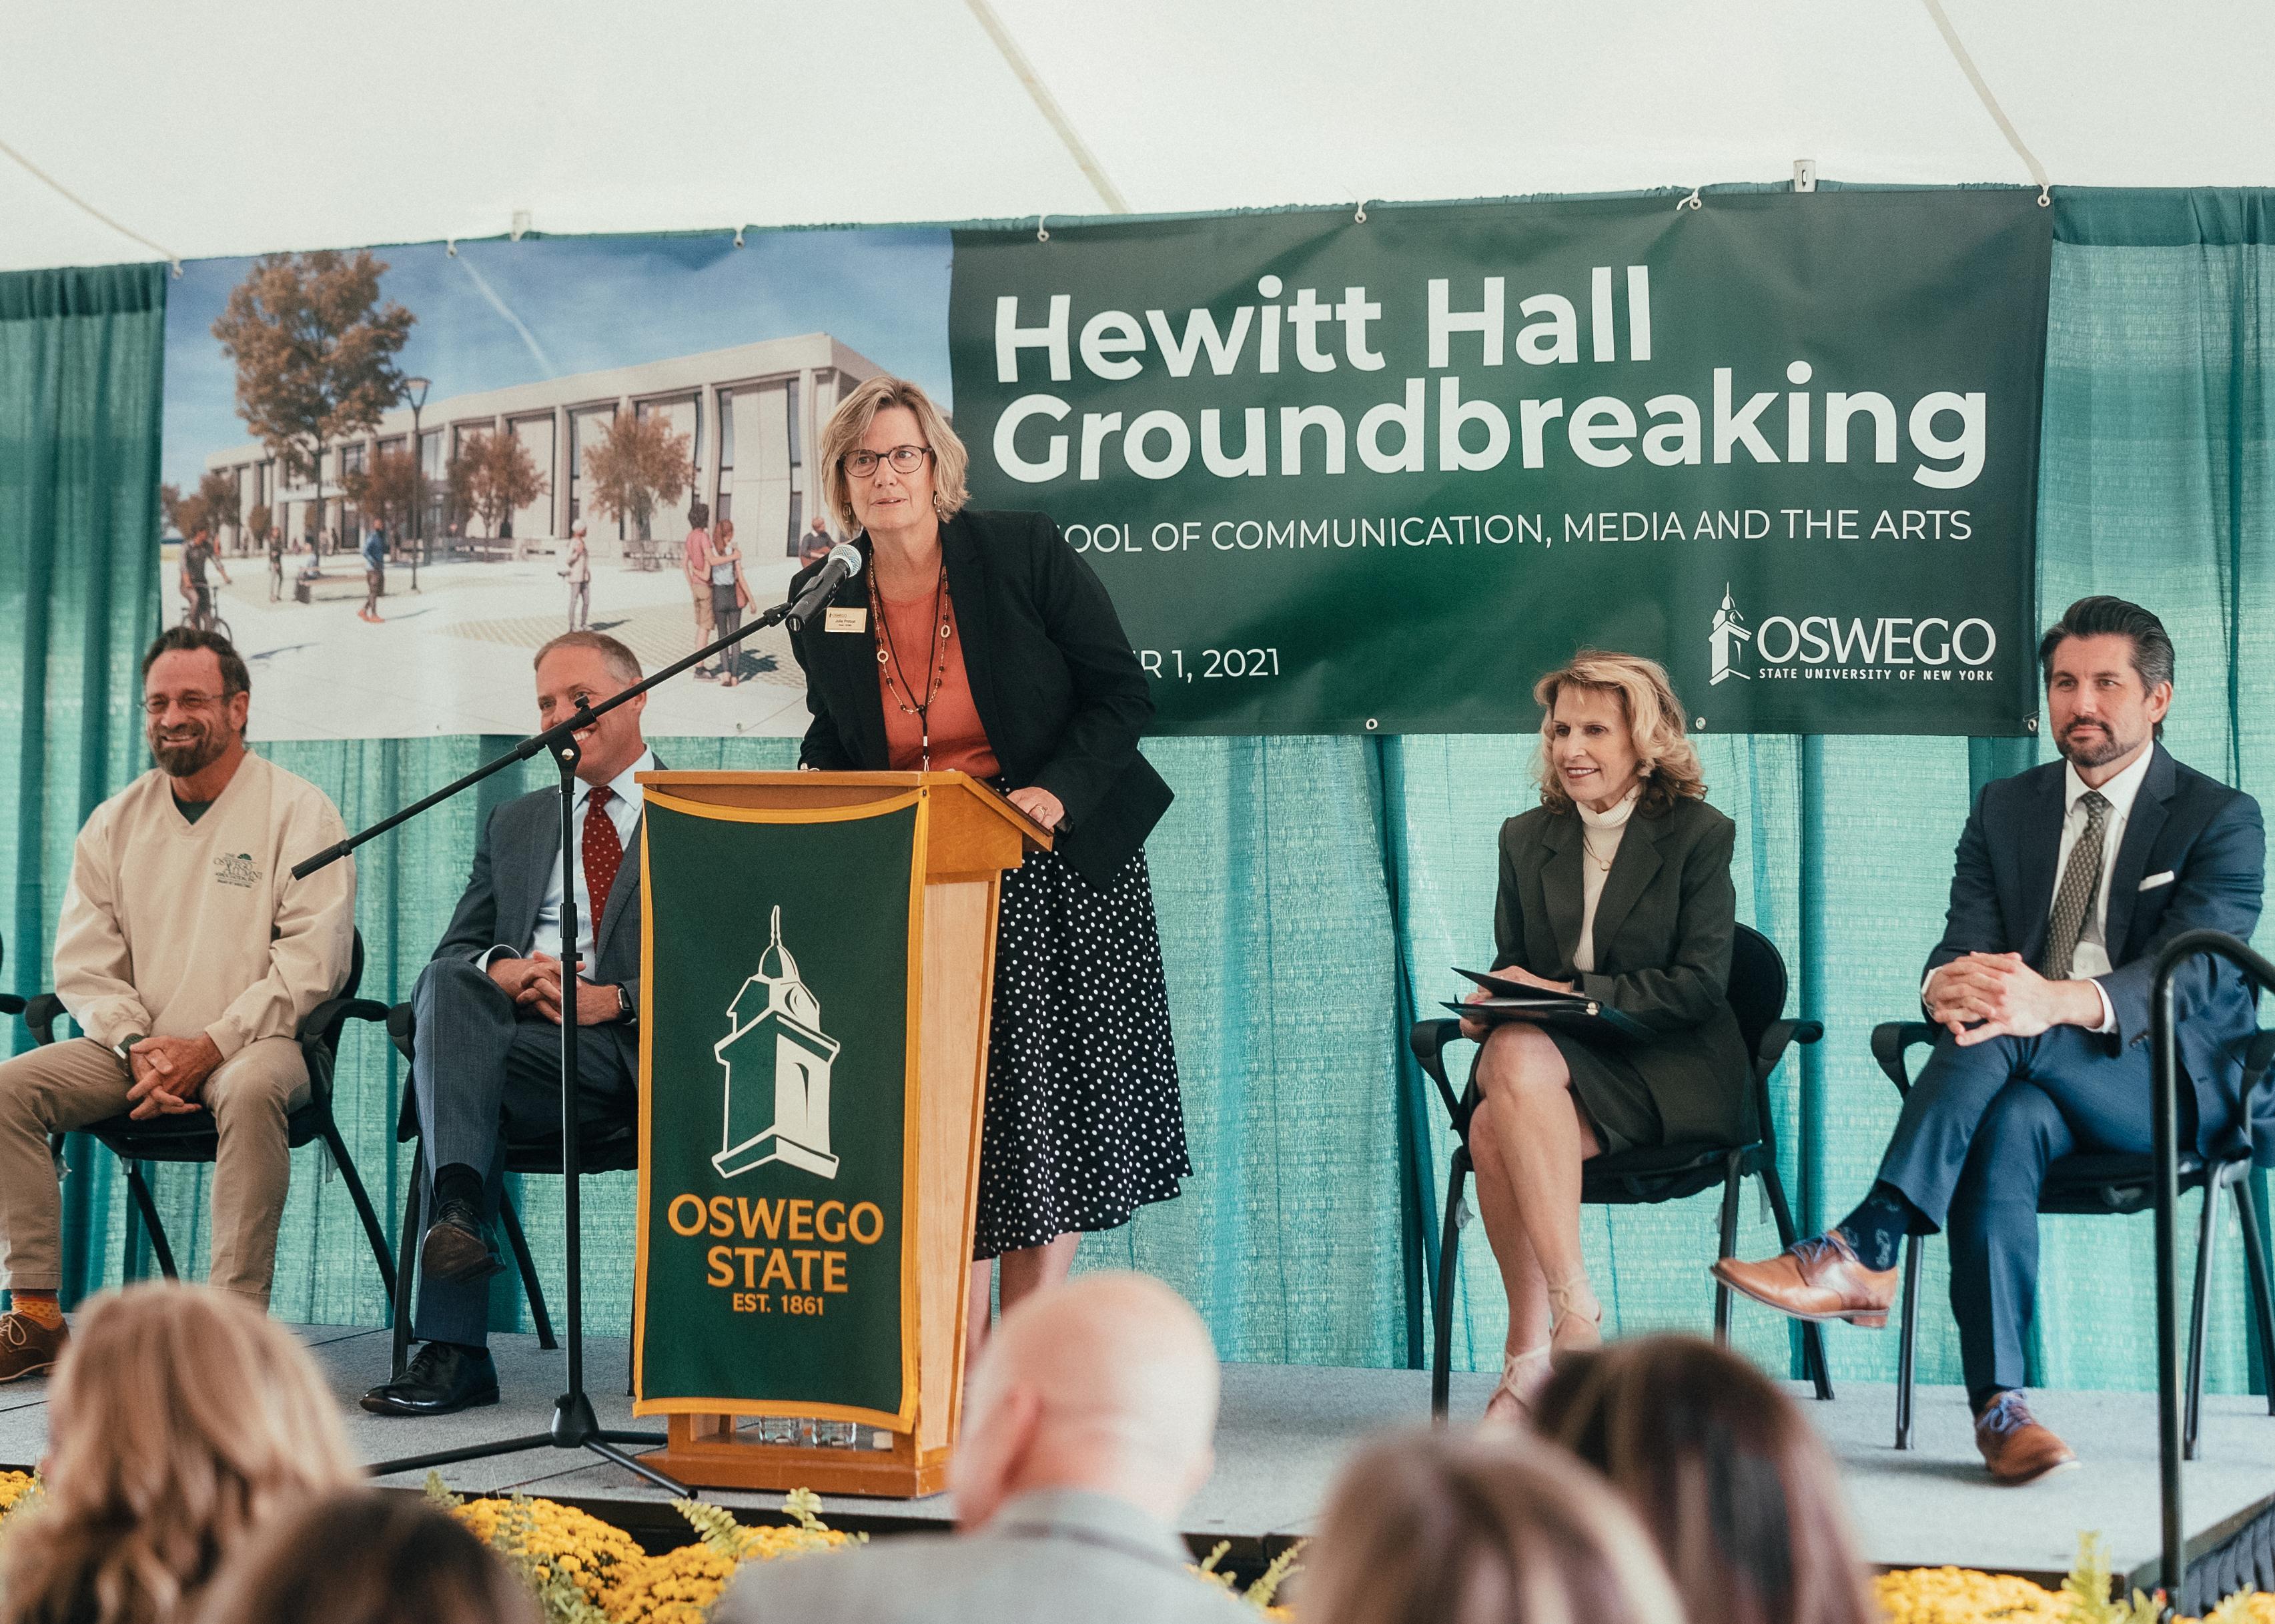 School of Communication, Media and the Arts Dean Julie Pretzat speaks at Hewitt groundbreaking